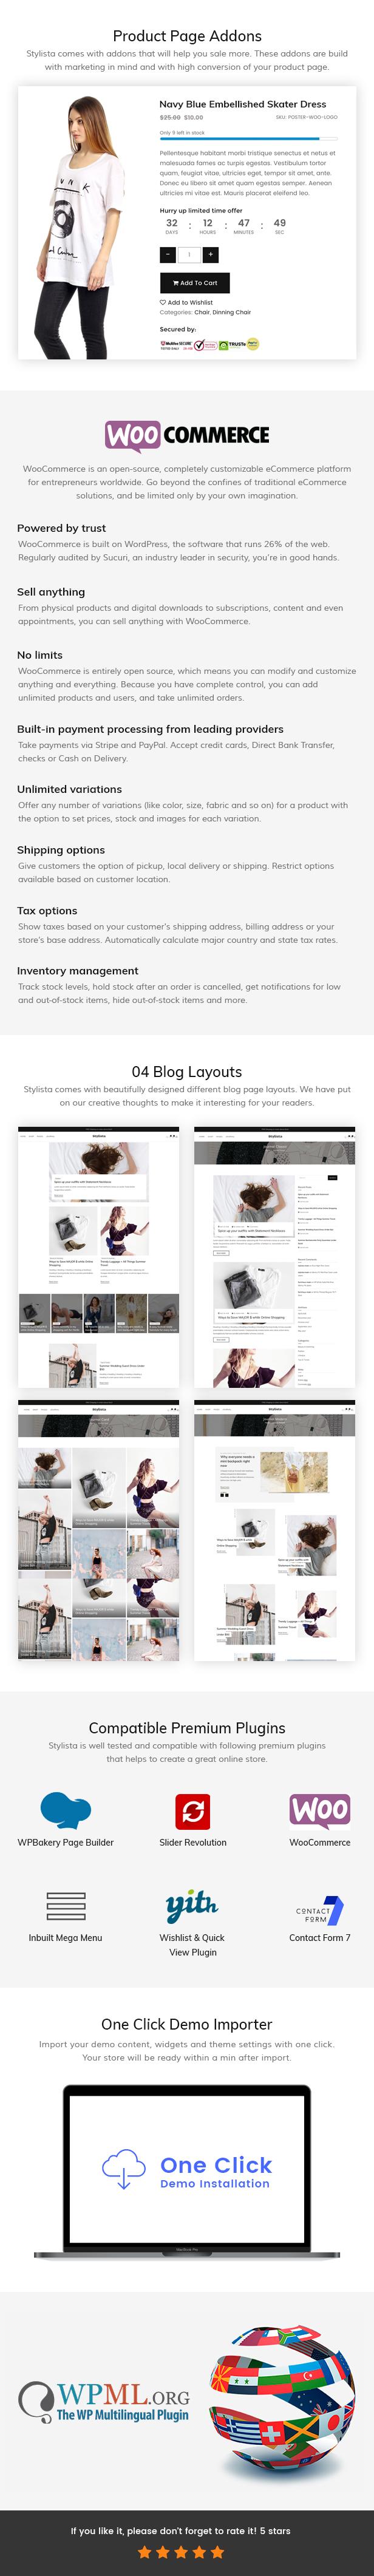 Stylista - Responsive Fashion WooCommerce WordPress Theme - 7